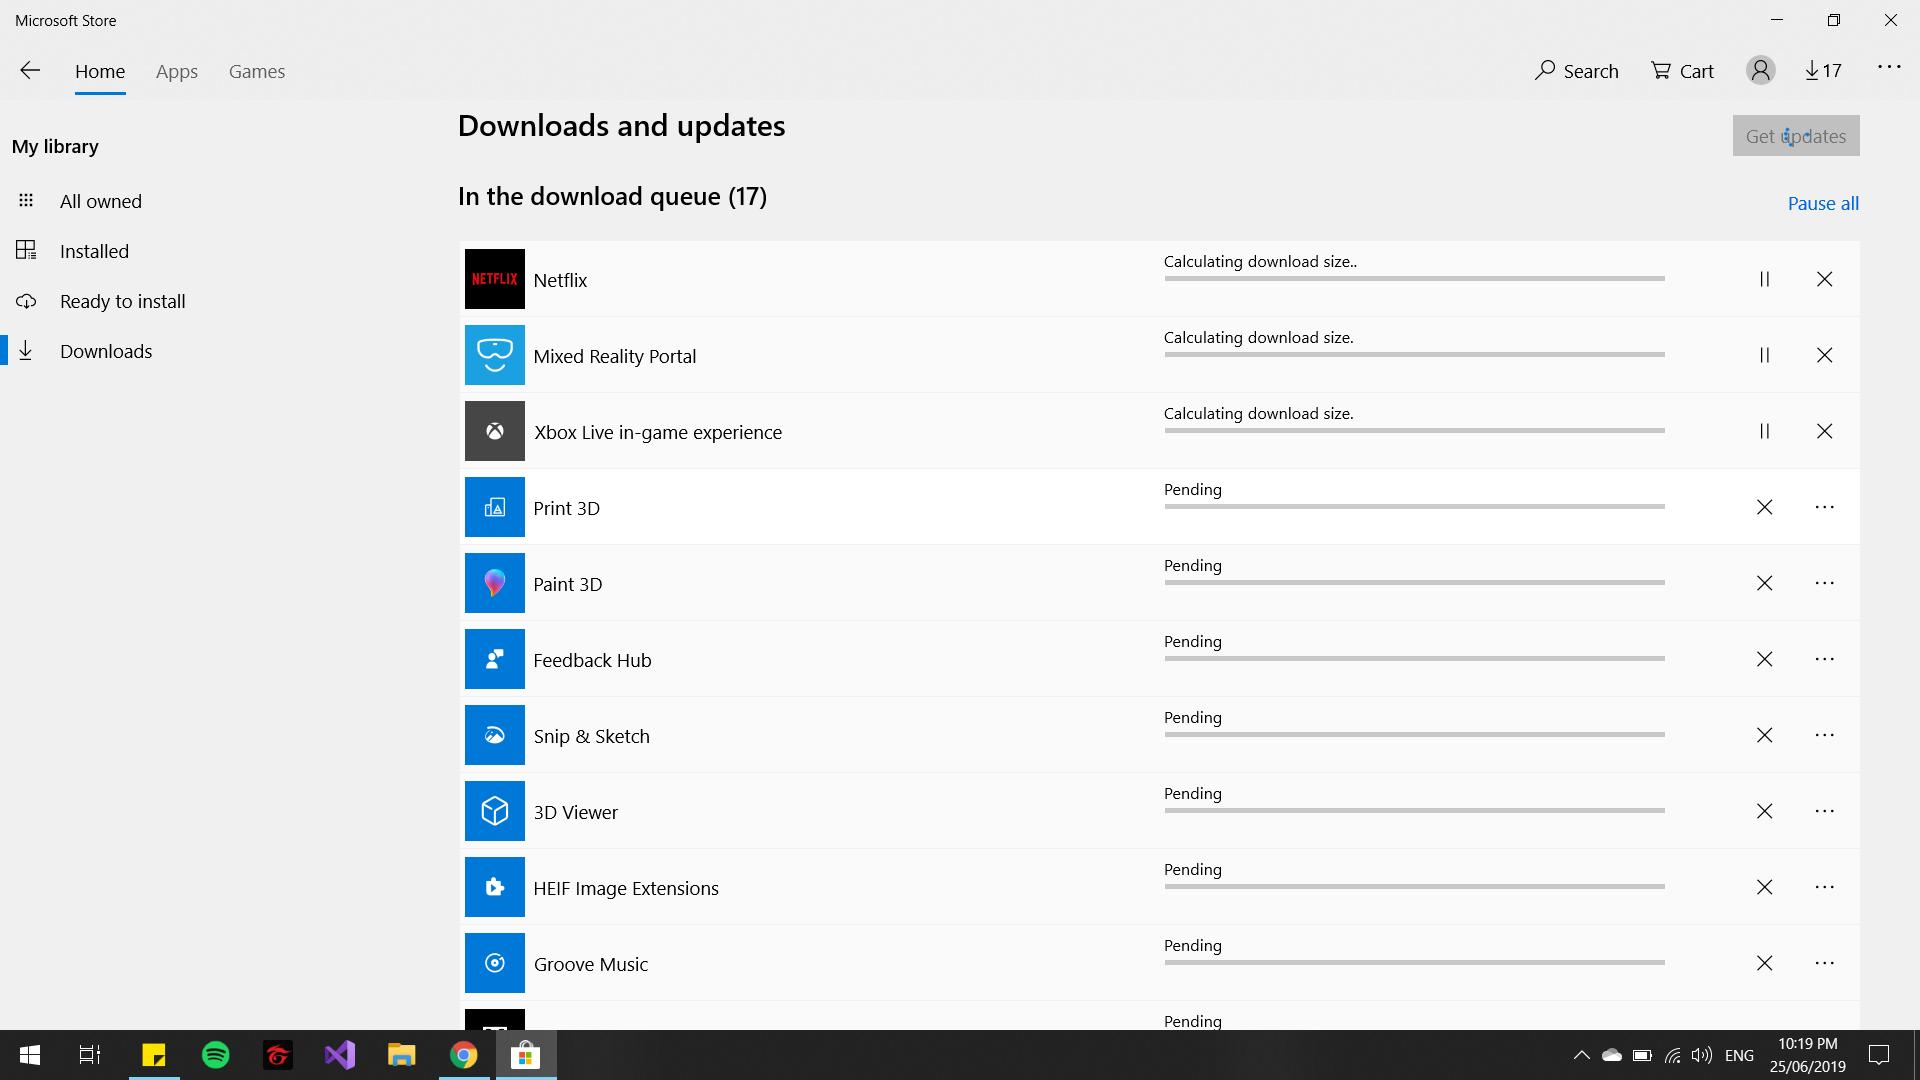 Microsoft Store 43653aa0-c311-4ac7-bf45-9e596840960f?upload=true.png